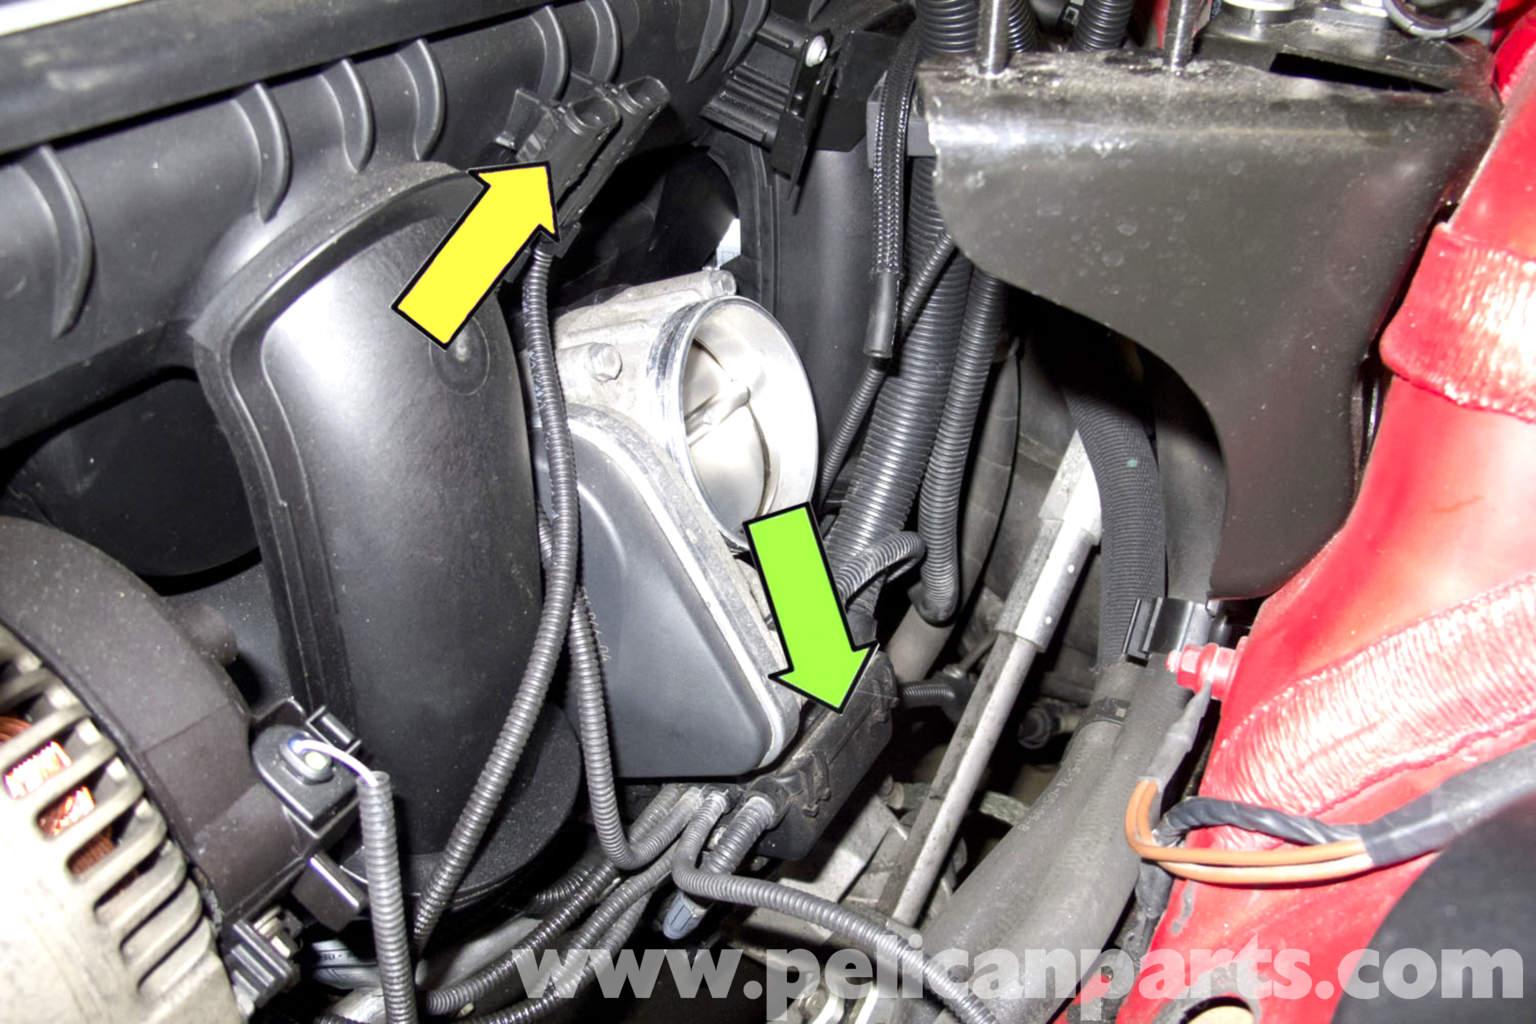 Bmw E90 Intake Manifold Replacement